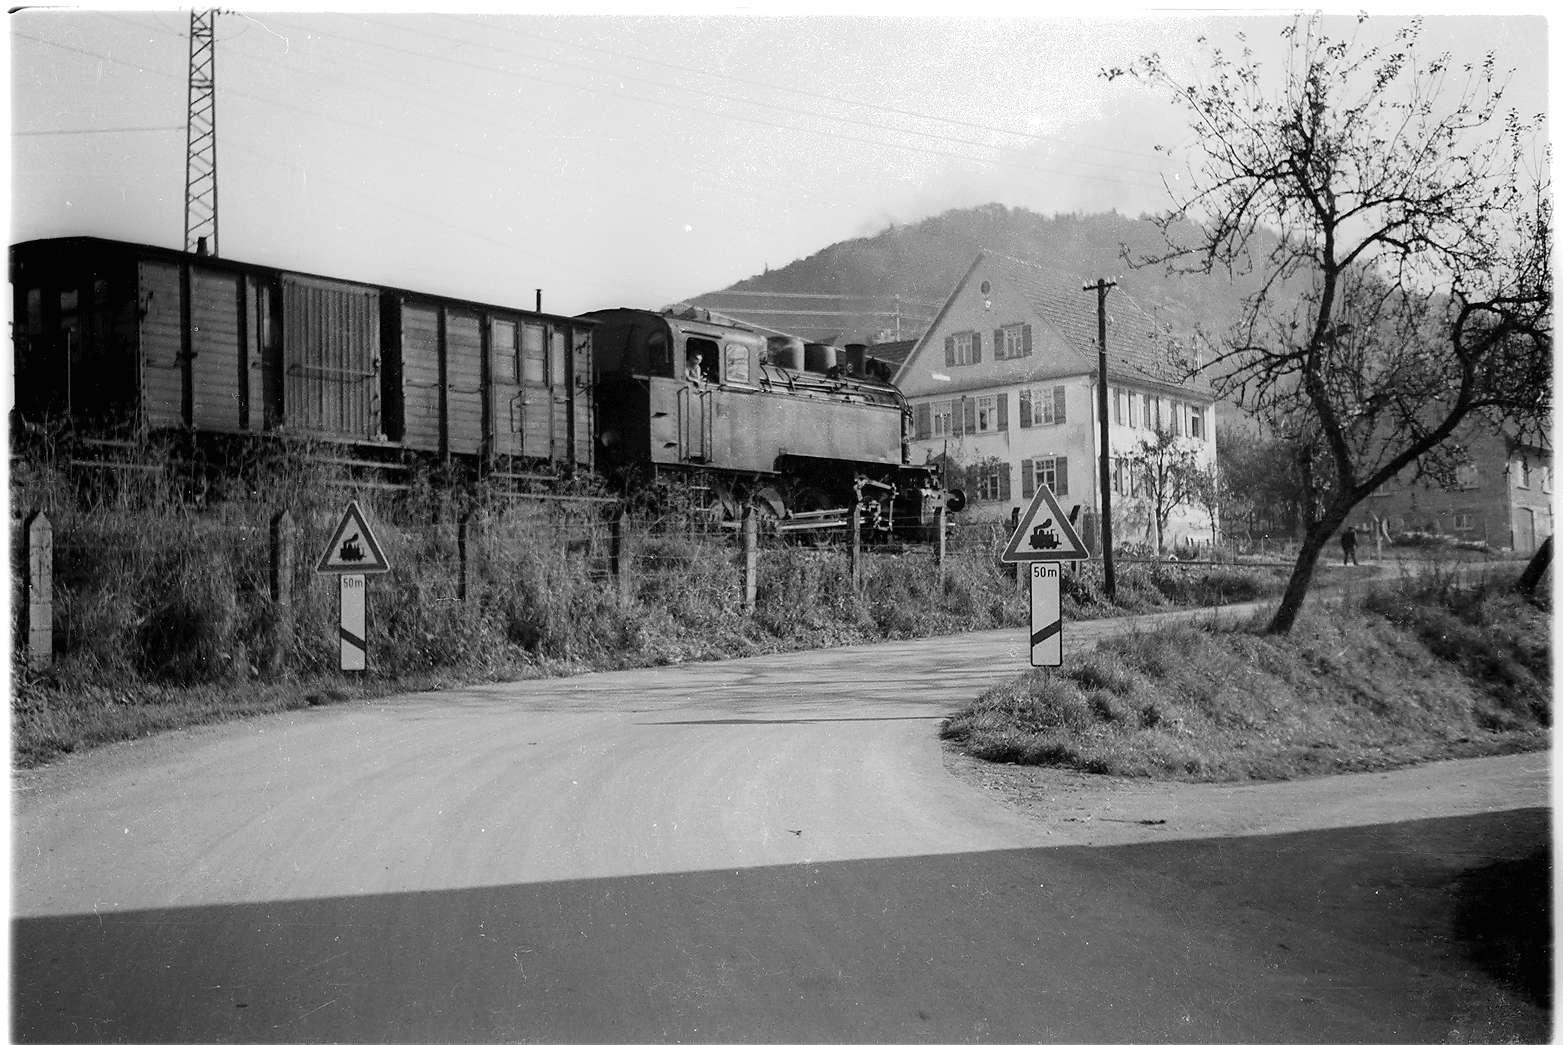 Bahnhof Killer, Bild 1